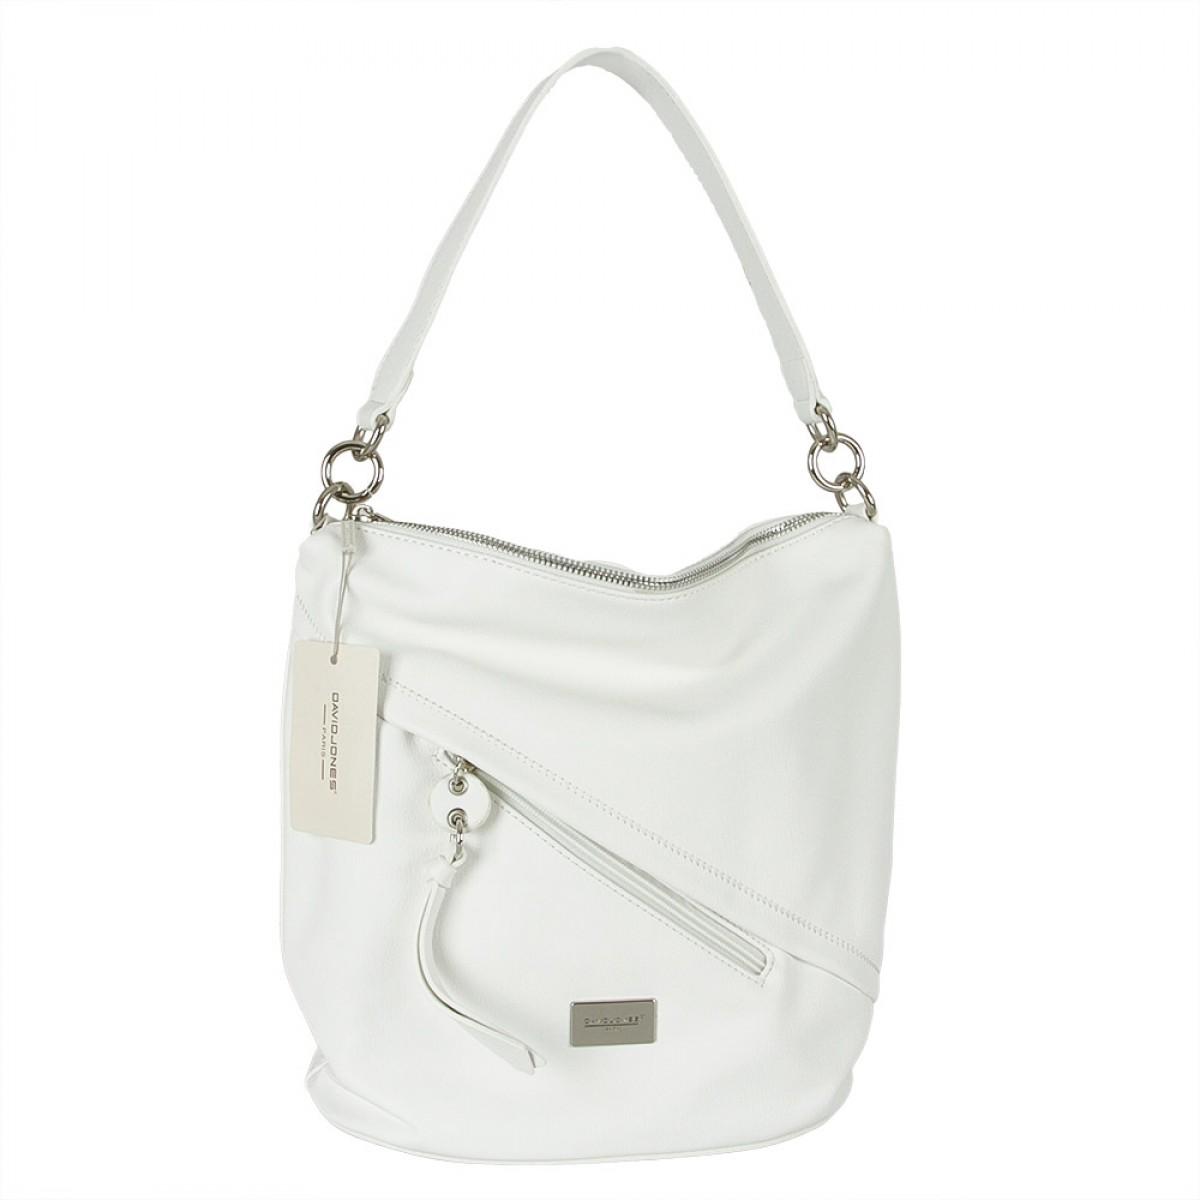 Жіноча сумка David Jones  6265-1 WHITE